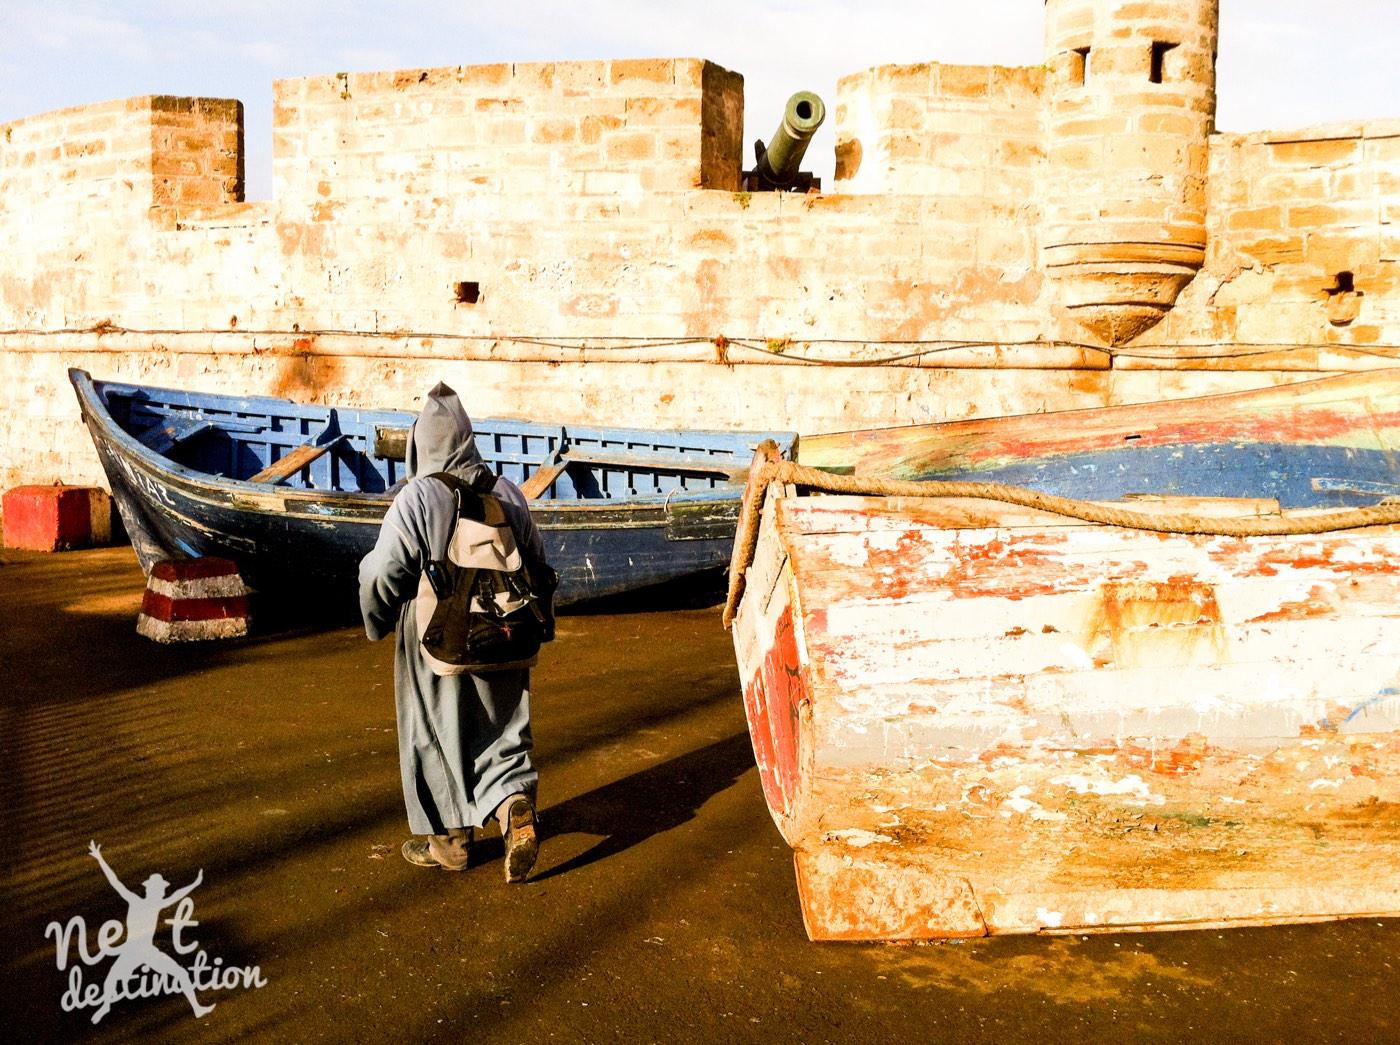 Taghazouthaven van Essaouira